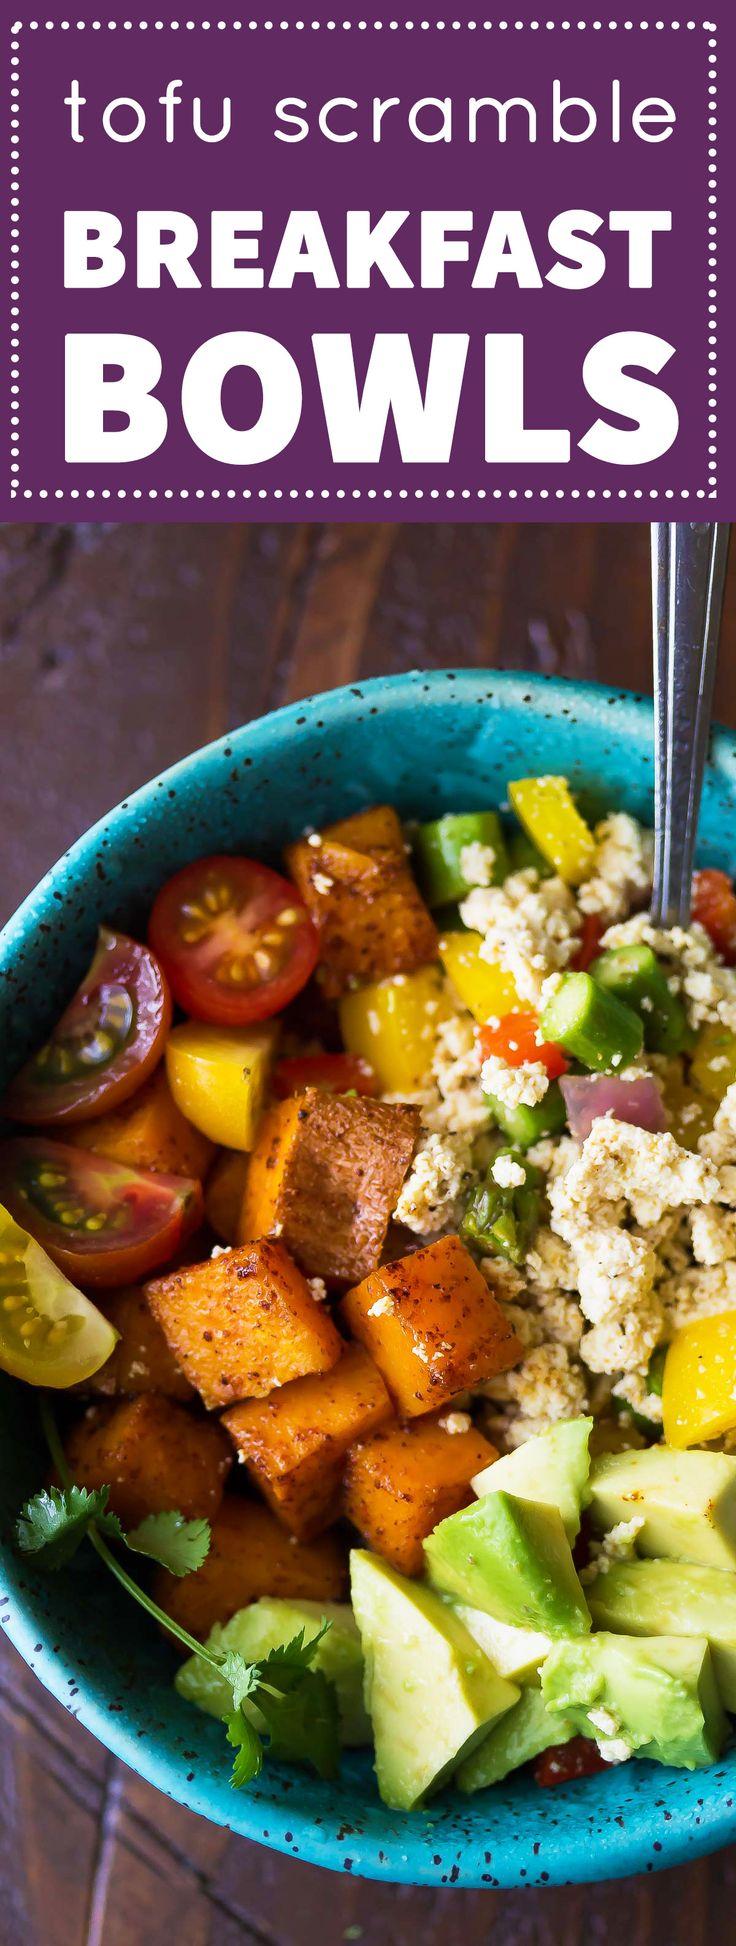 Tofu scramble, Tofu and Breakfast on Pinterest